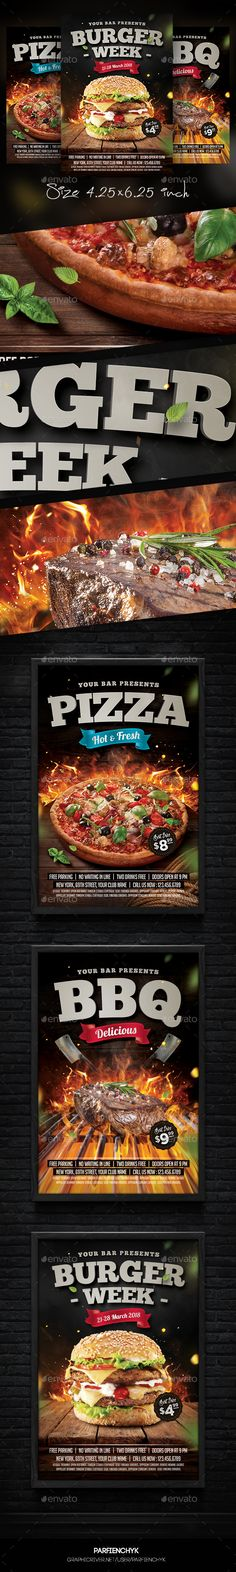 Burger Steak Pizza Flyer Templates PSD Bundle. Download here: https://graphicriver.net/item/burger-steak-pizza-flyer-bundle/17217276?ref=ksioks